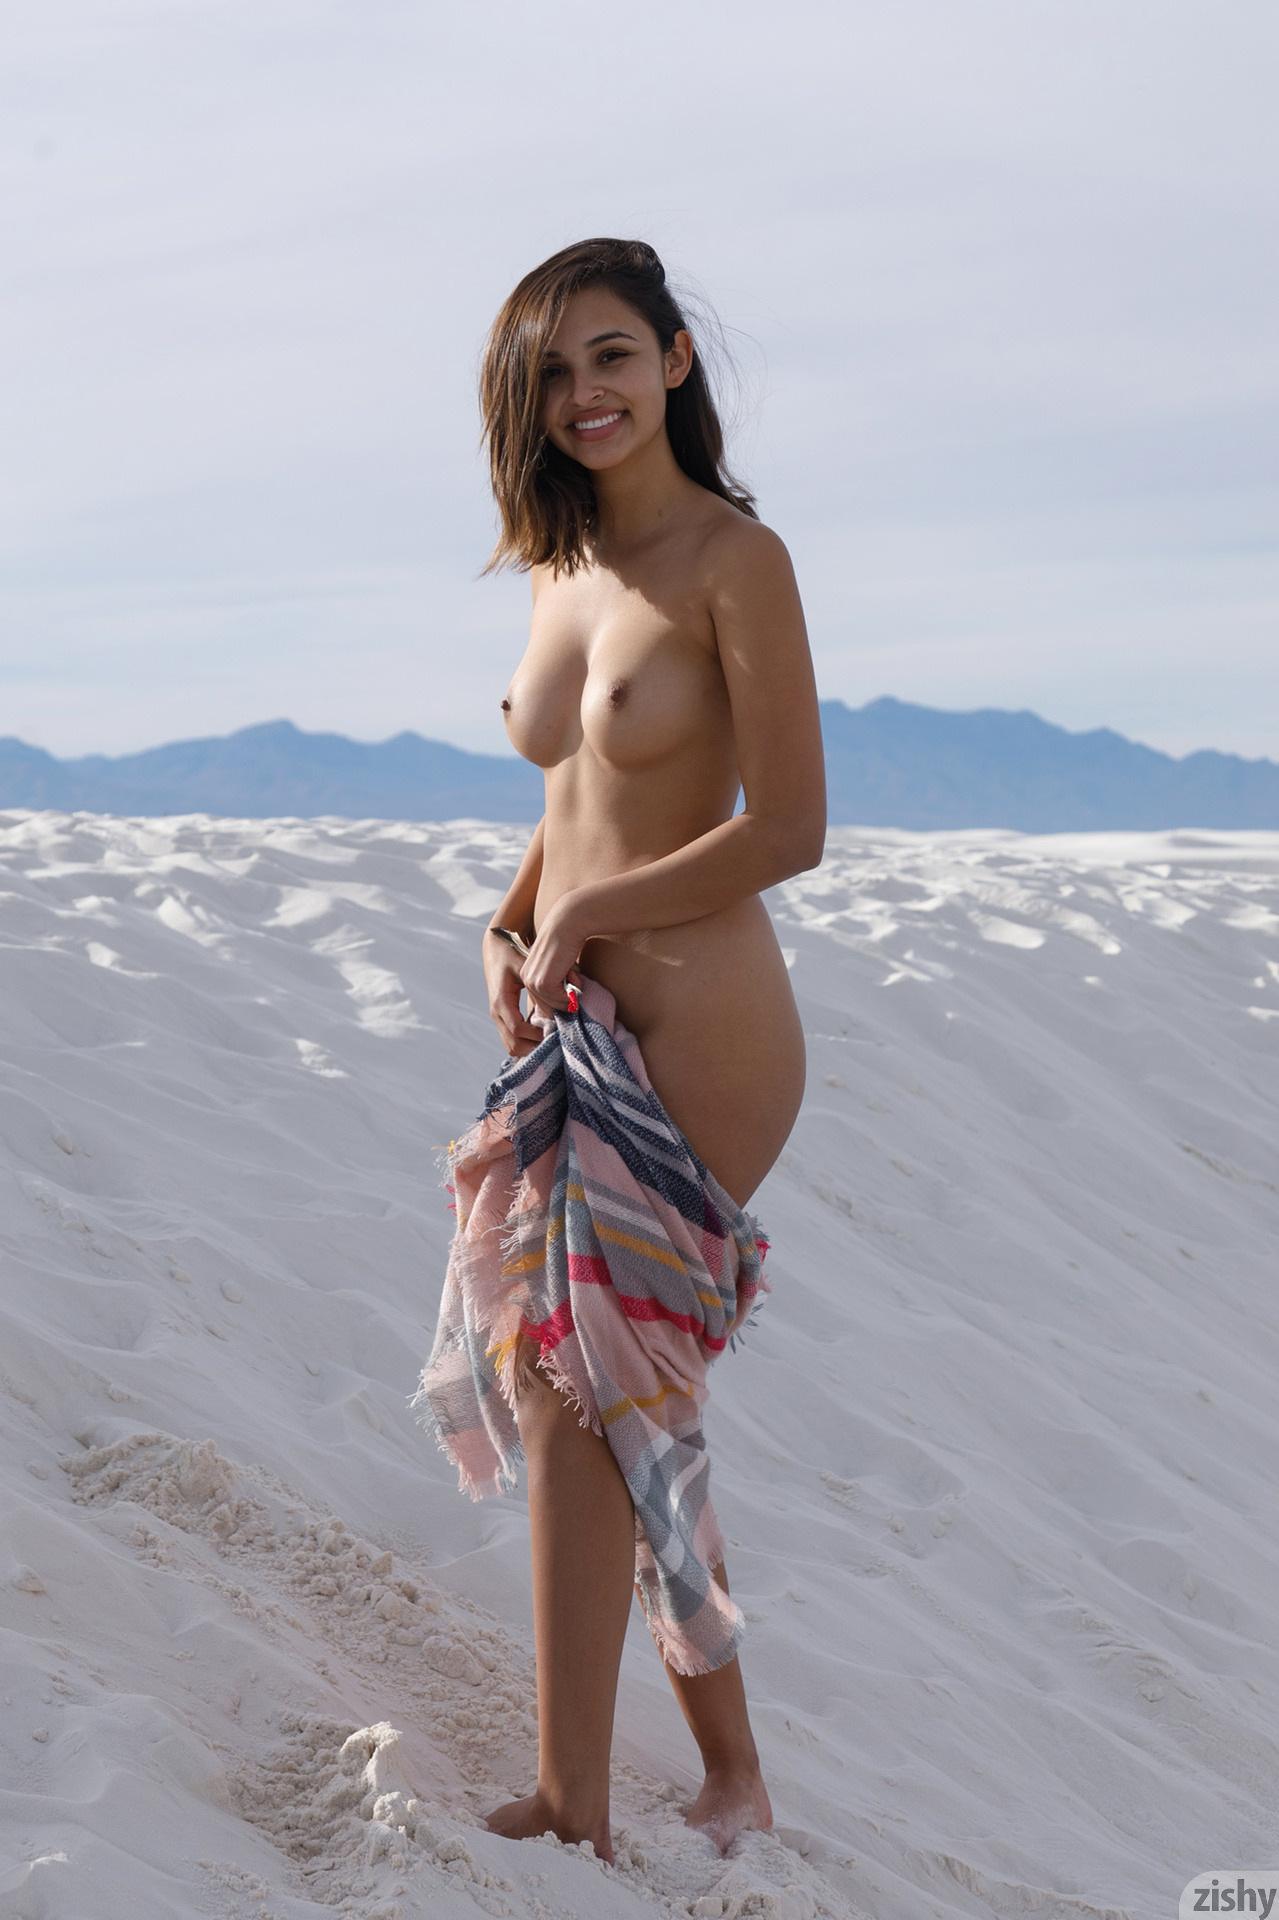 Alejandra Cobos White Sands 3 Zishy (5)